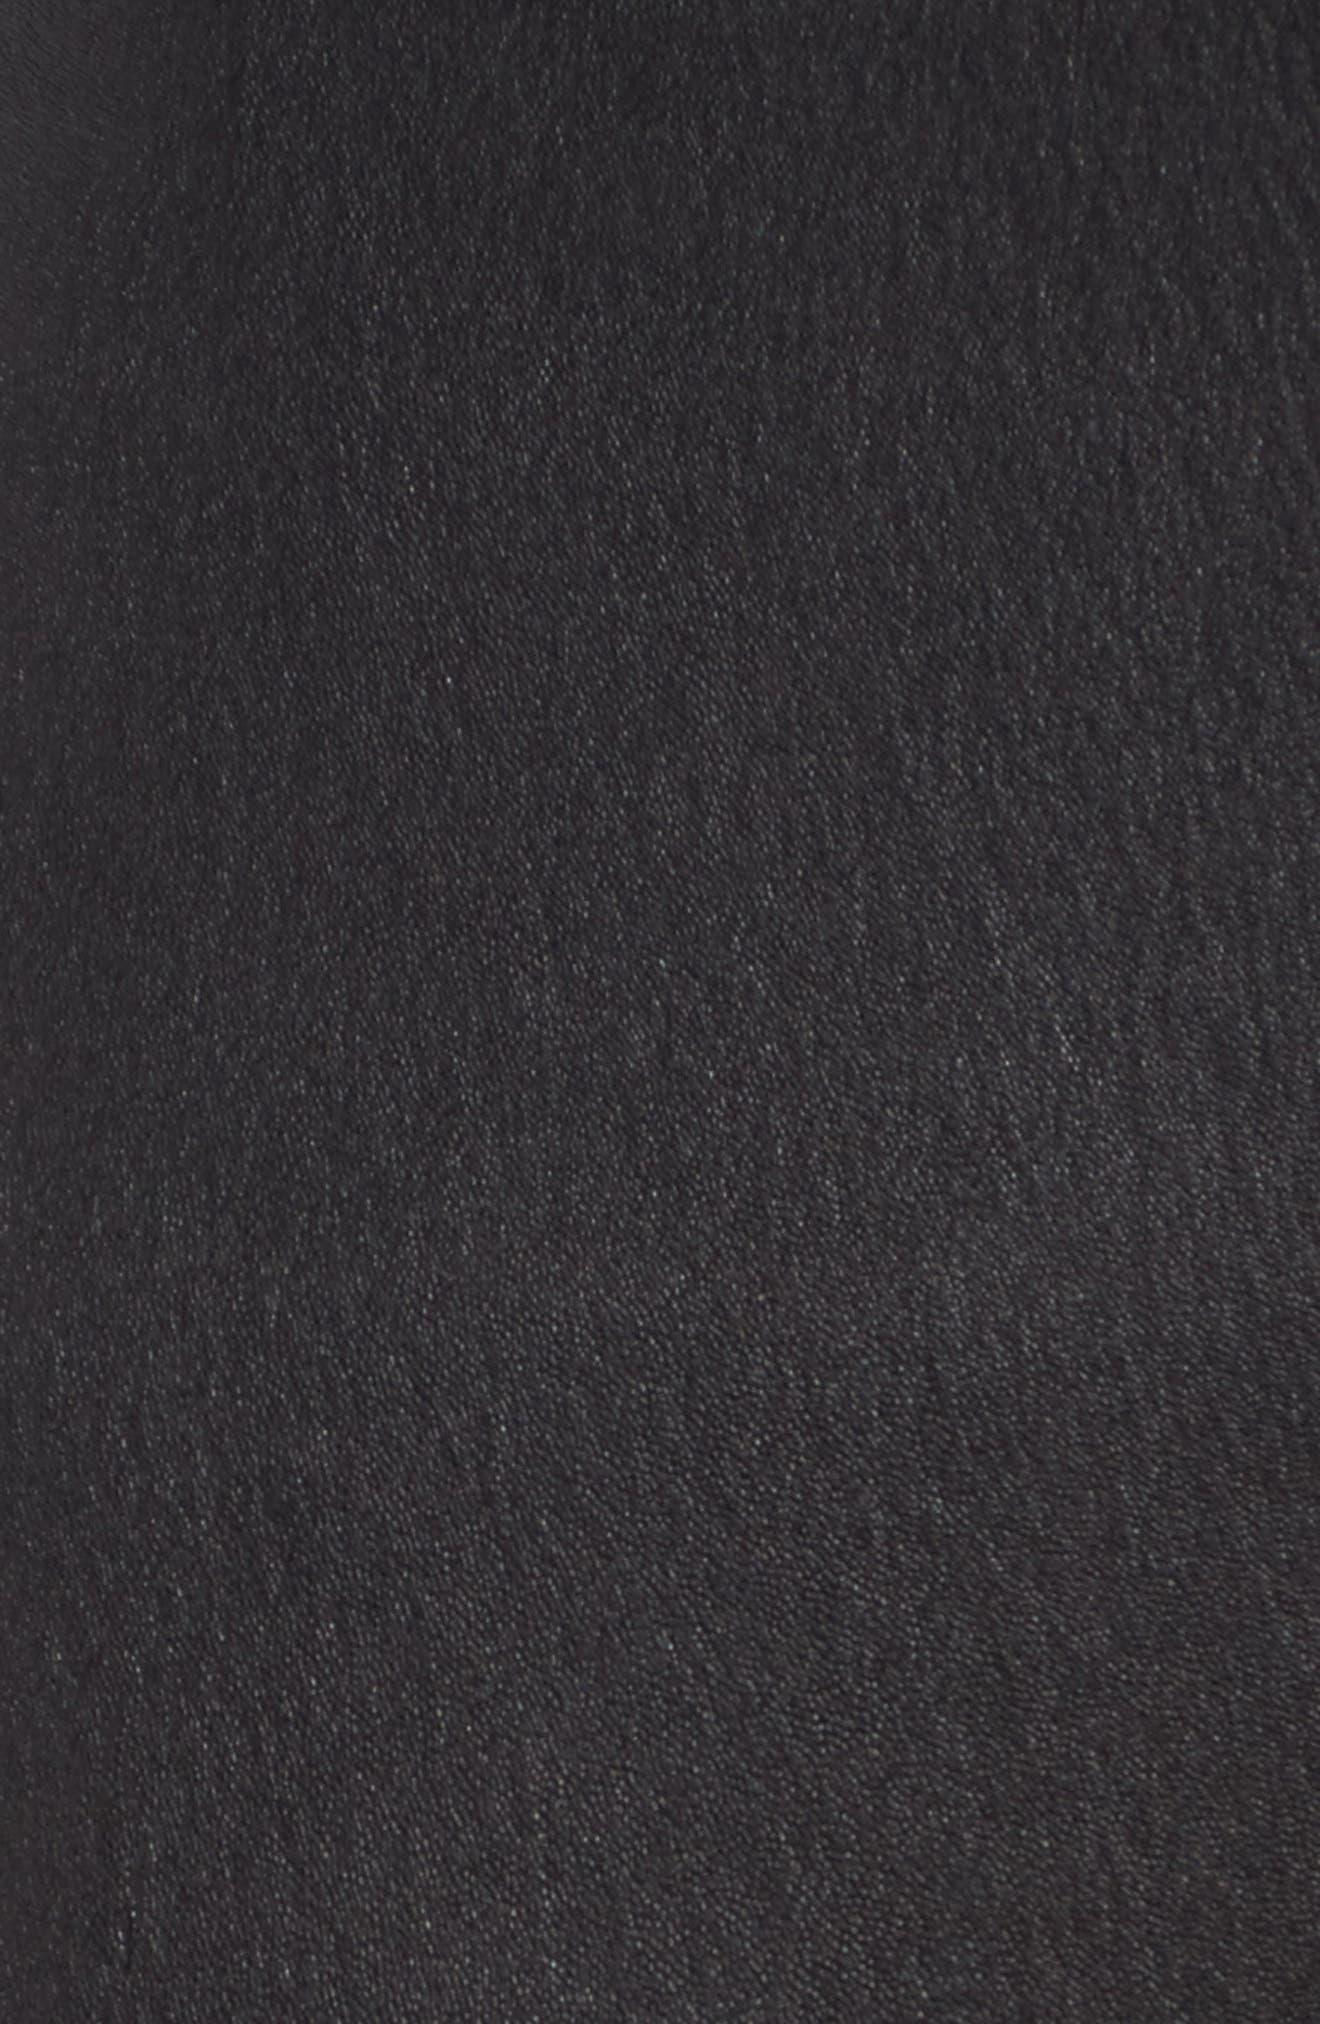 Leather Blocked Leggings,                             Alternate thumbnail 5, color,                             Black